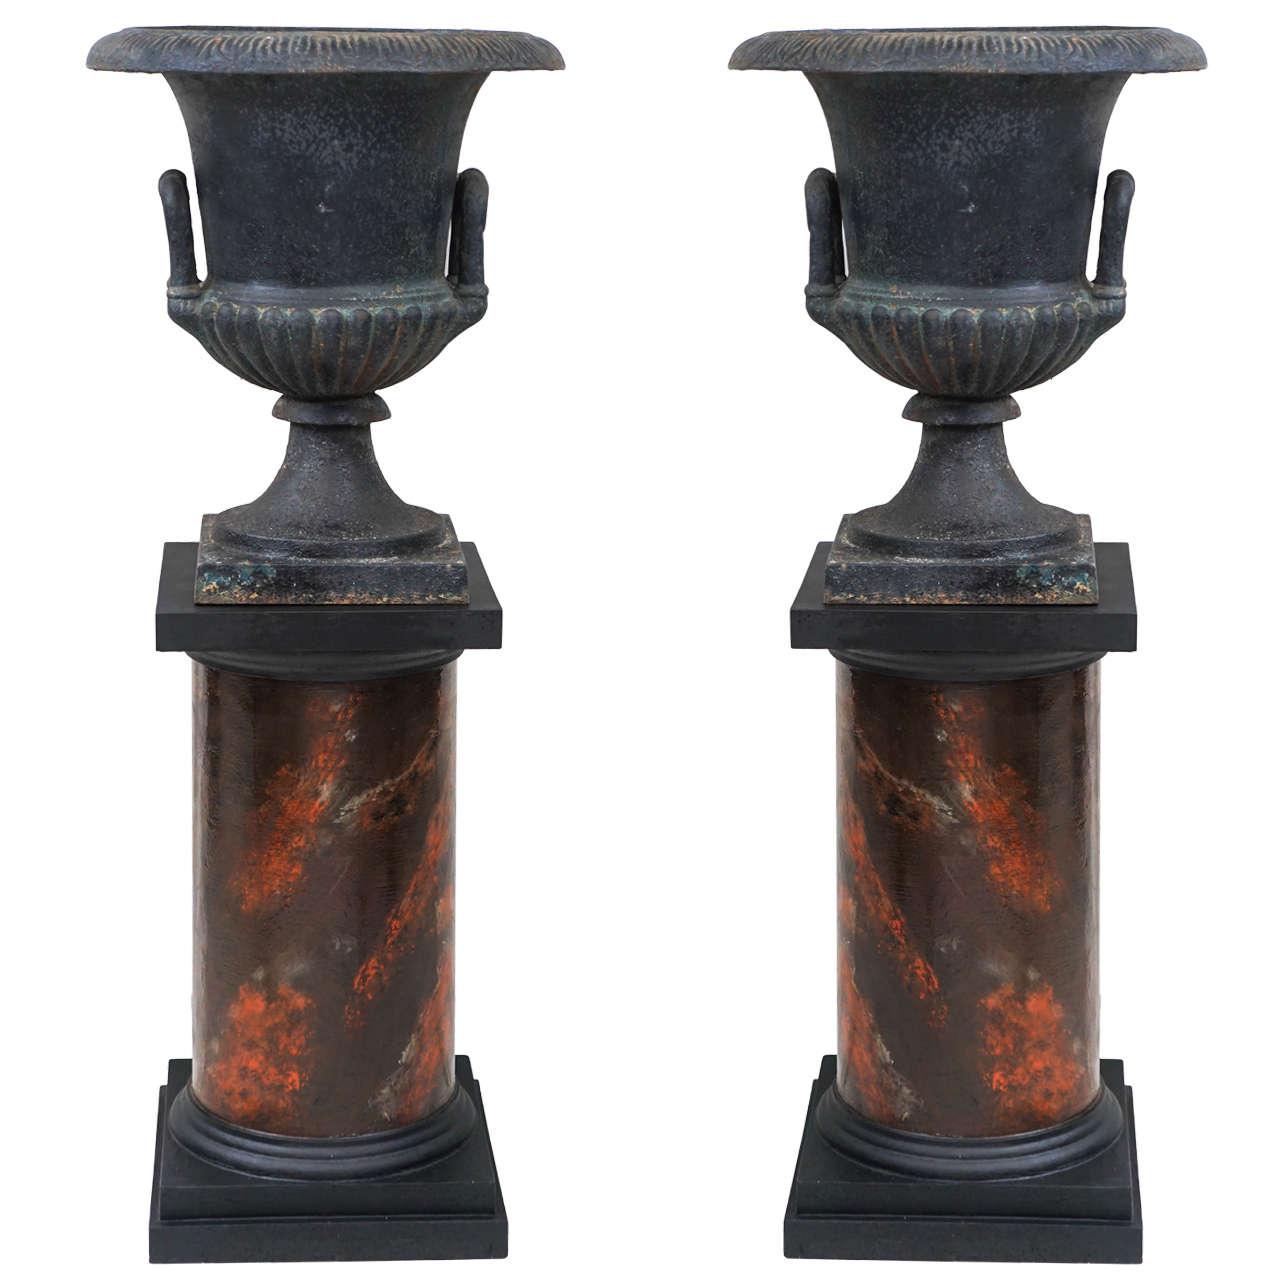 Pair Of 19th Century Cast Iron Urns On Marbleized